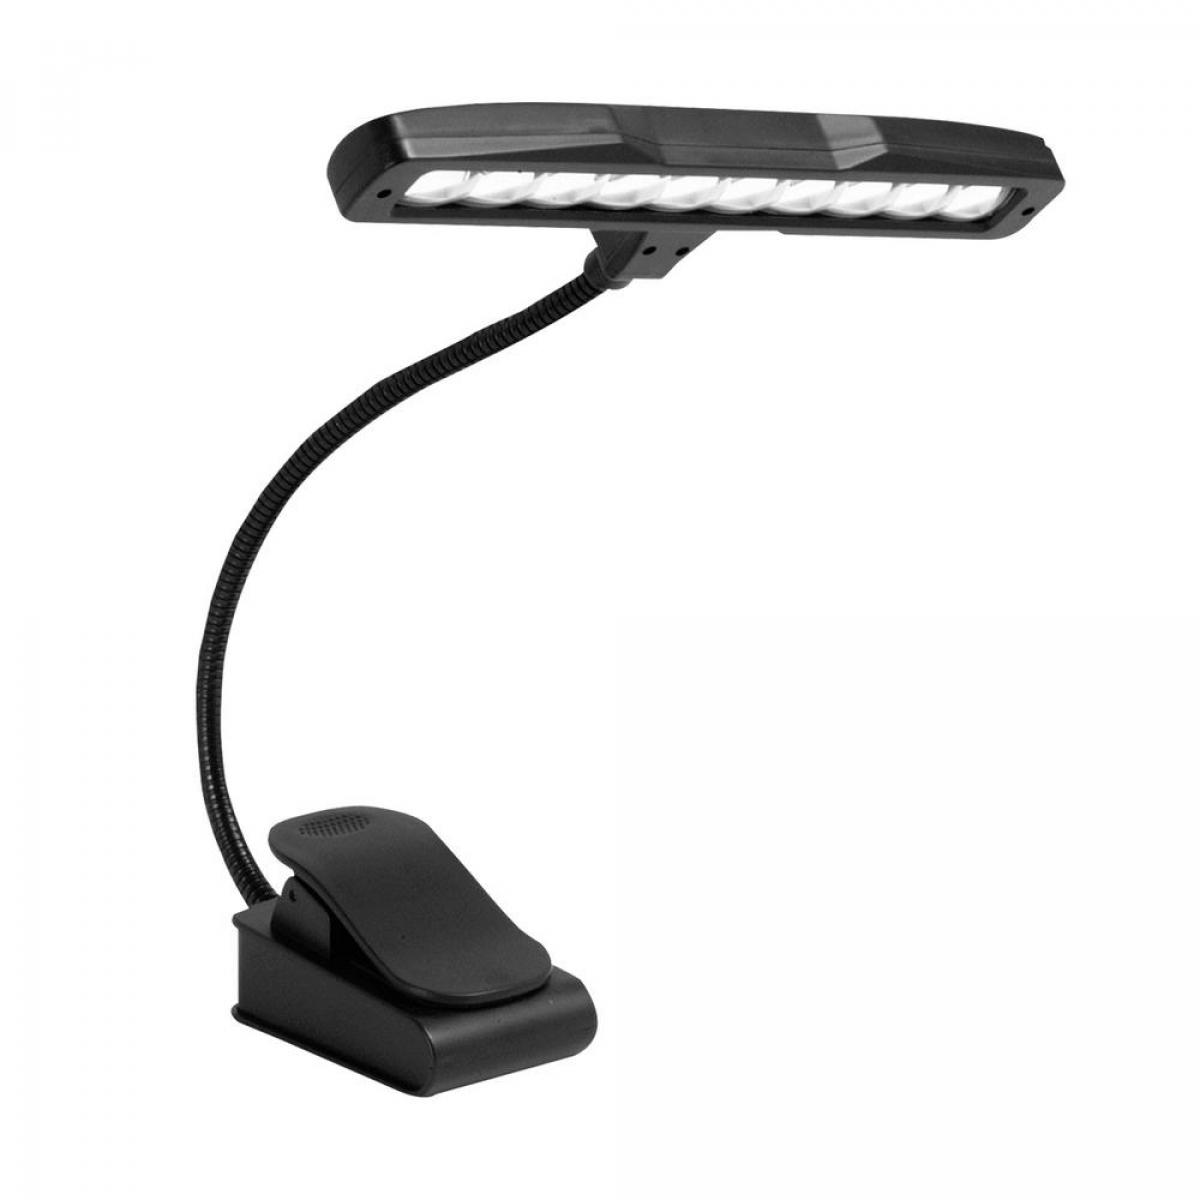 OSG ORCH Light LED510 w/pwr adptr & bag